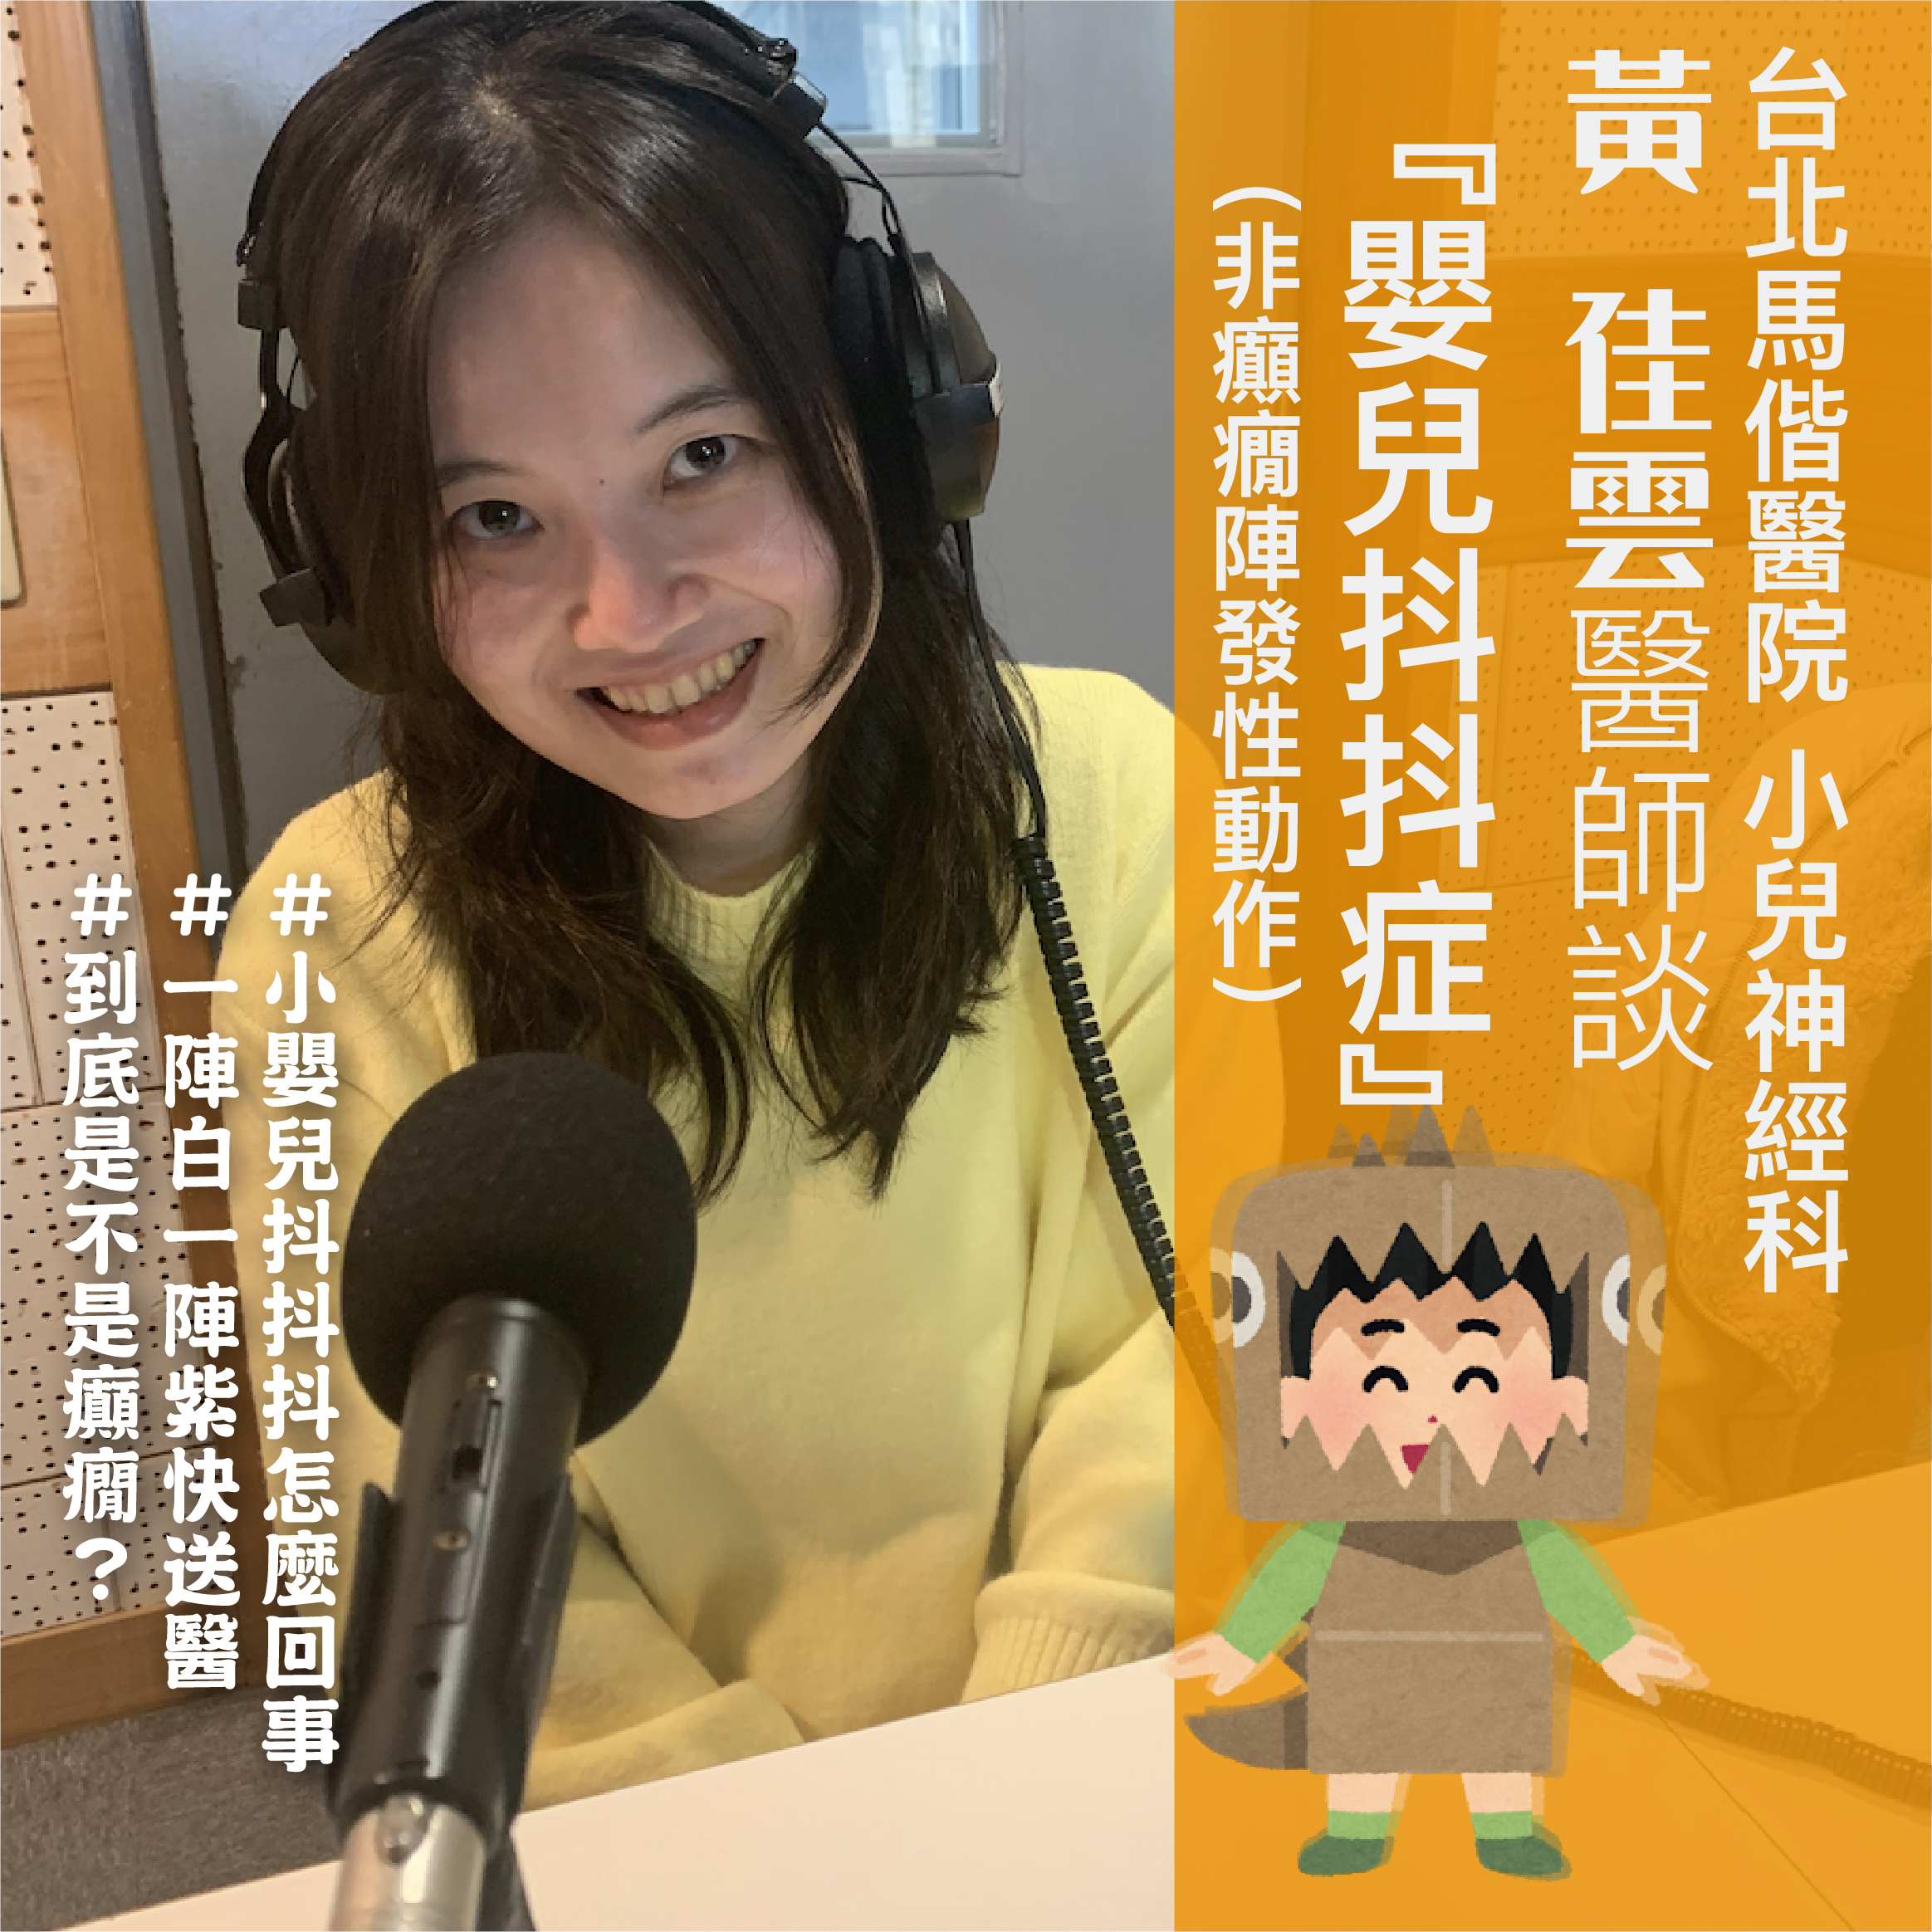 【Ep.32】小寶貝是『嬰兒抖抖症』嗎?feat. 台北馬偕小兒神經科-黃佳雲醫師